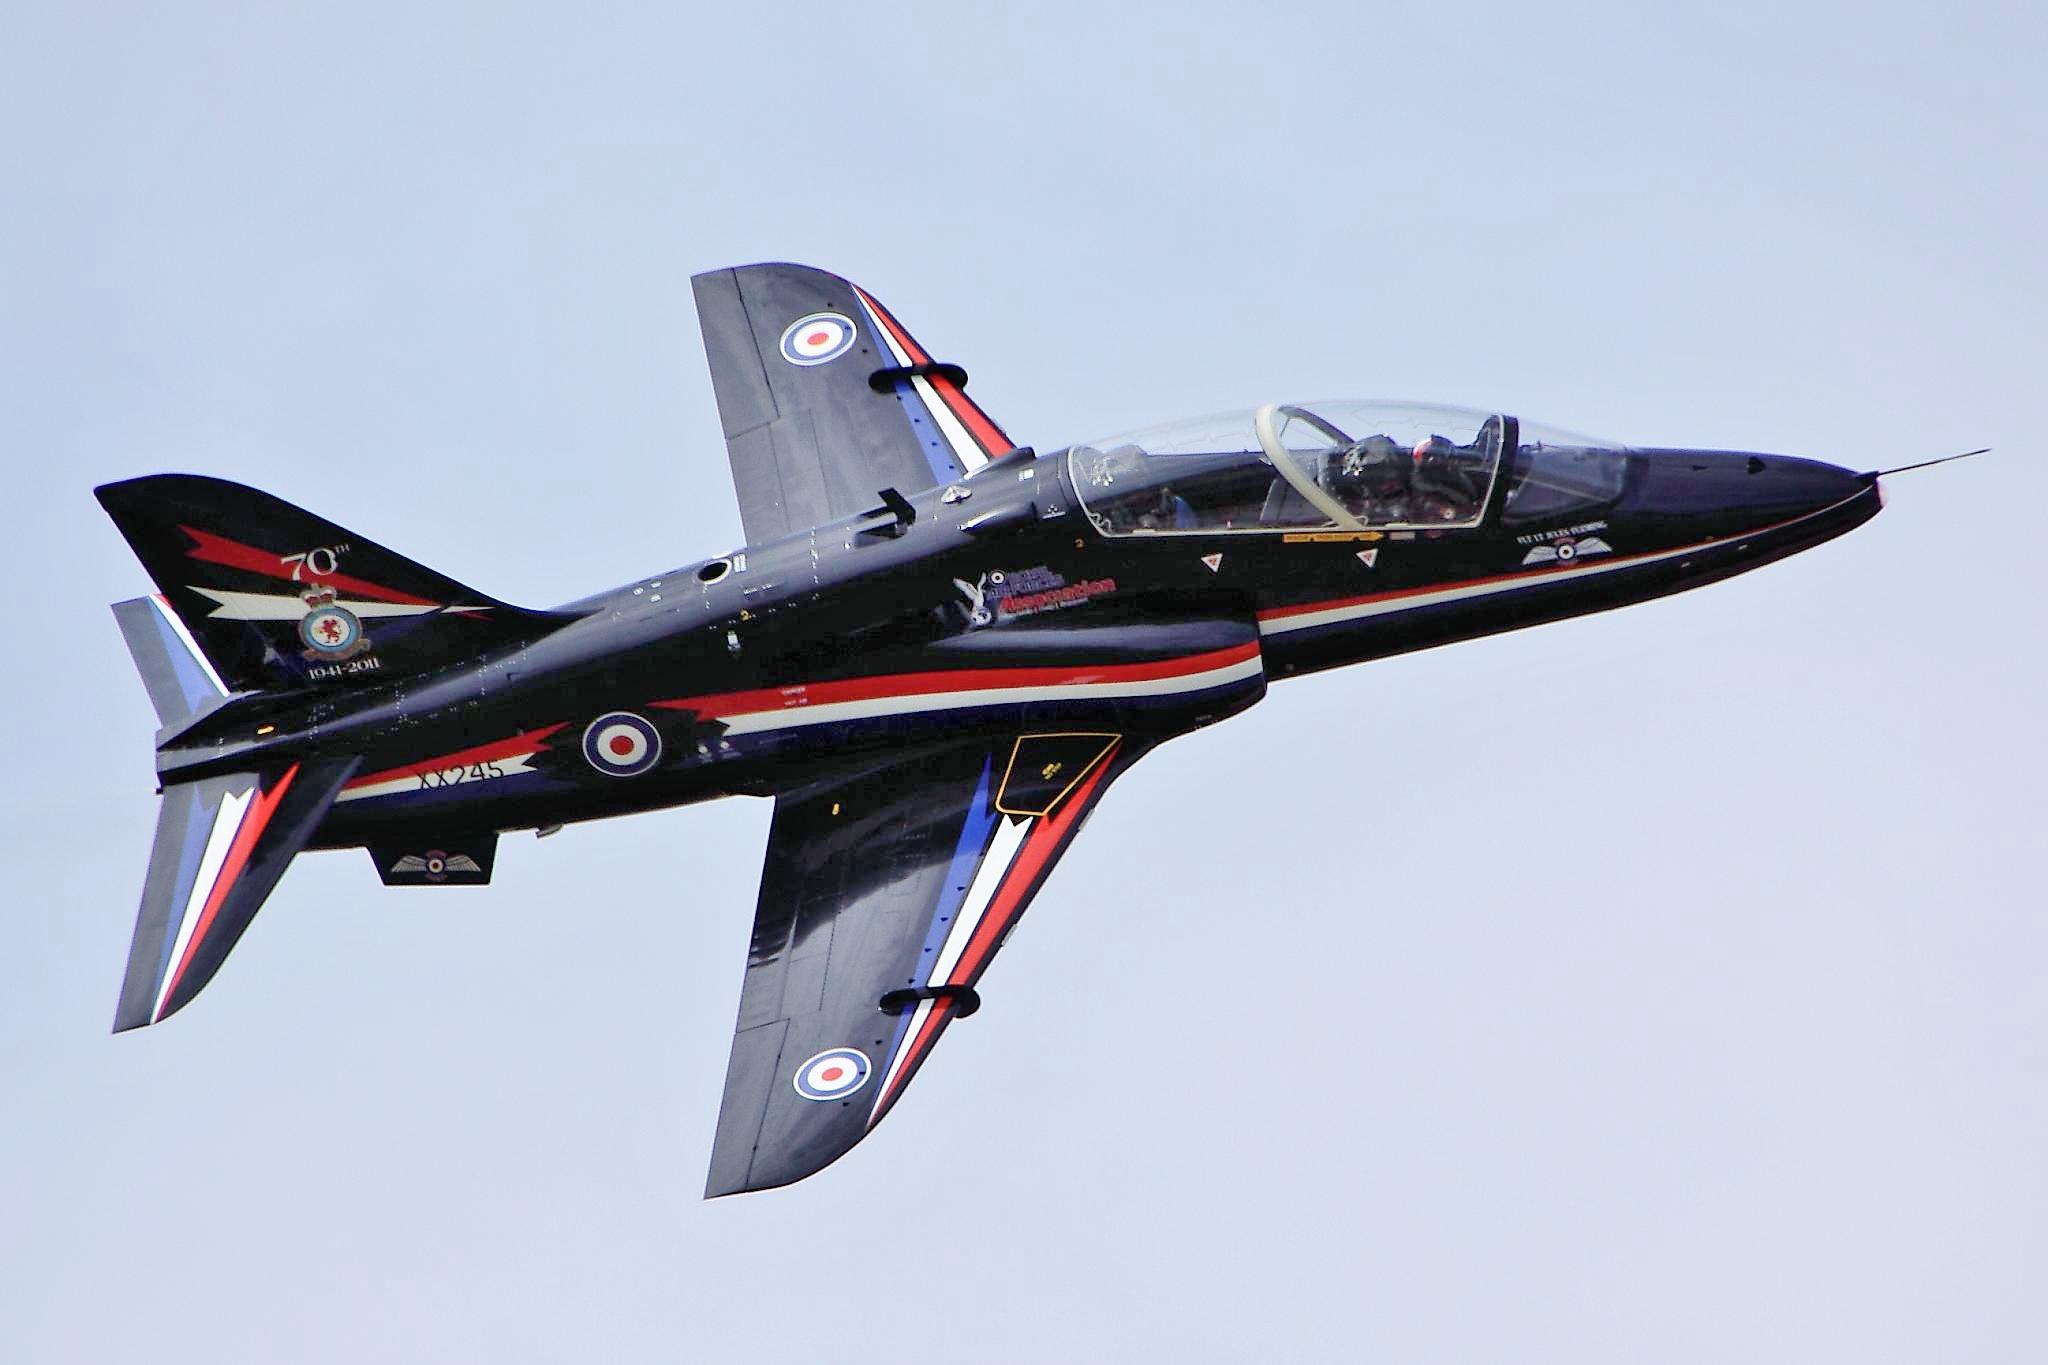 BAE Systems Hawk - Wikipedia